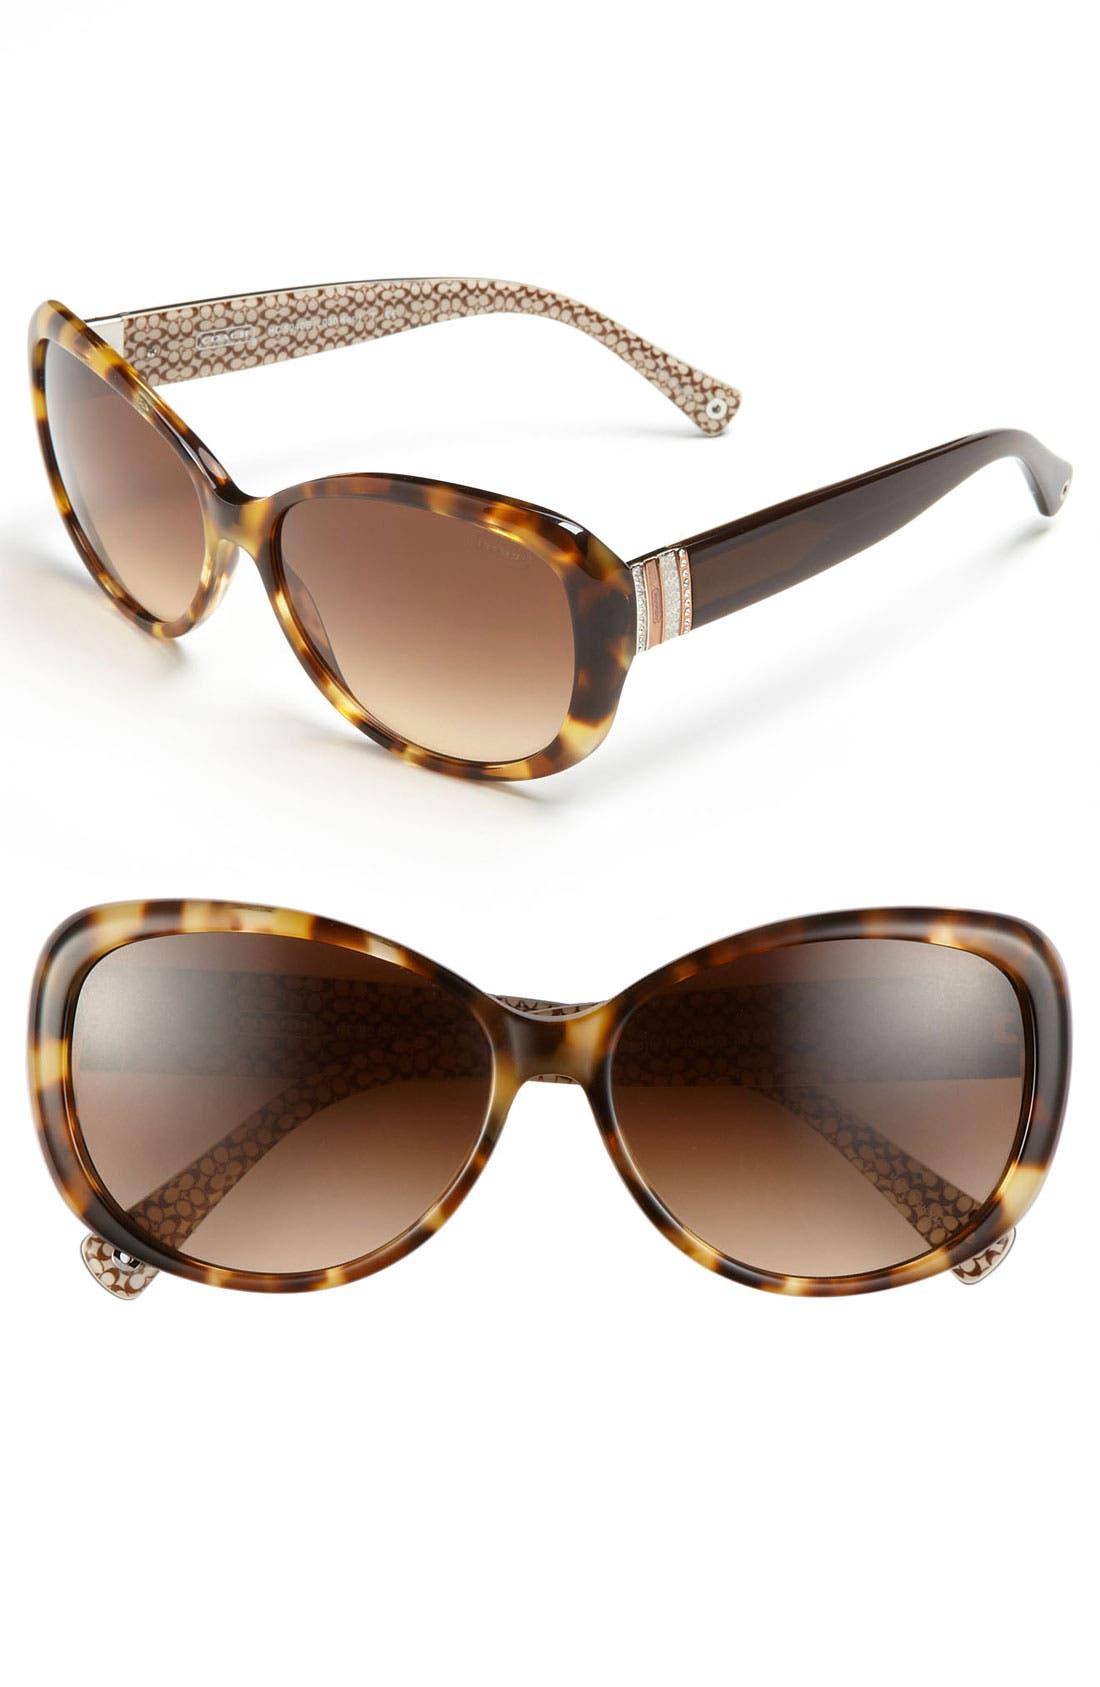 Alternate Image 1 Selected - COACH 58mm Oversized Sunglasses